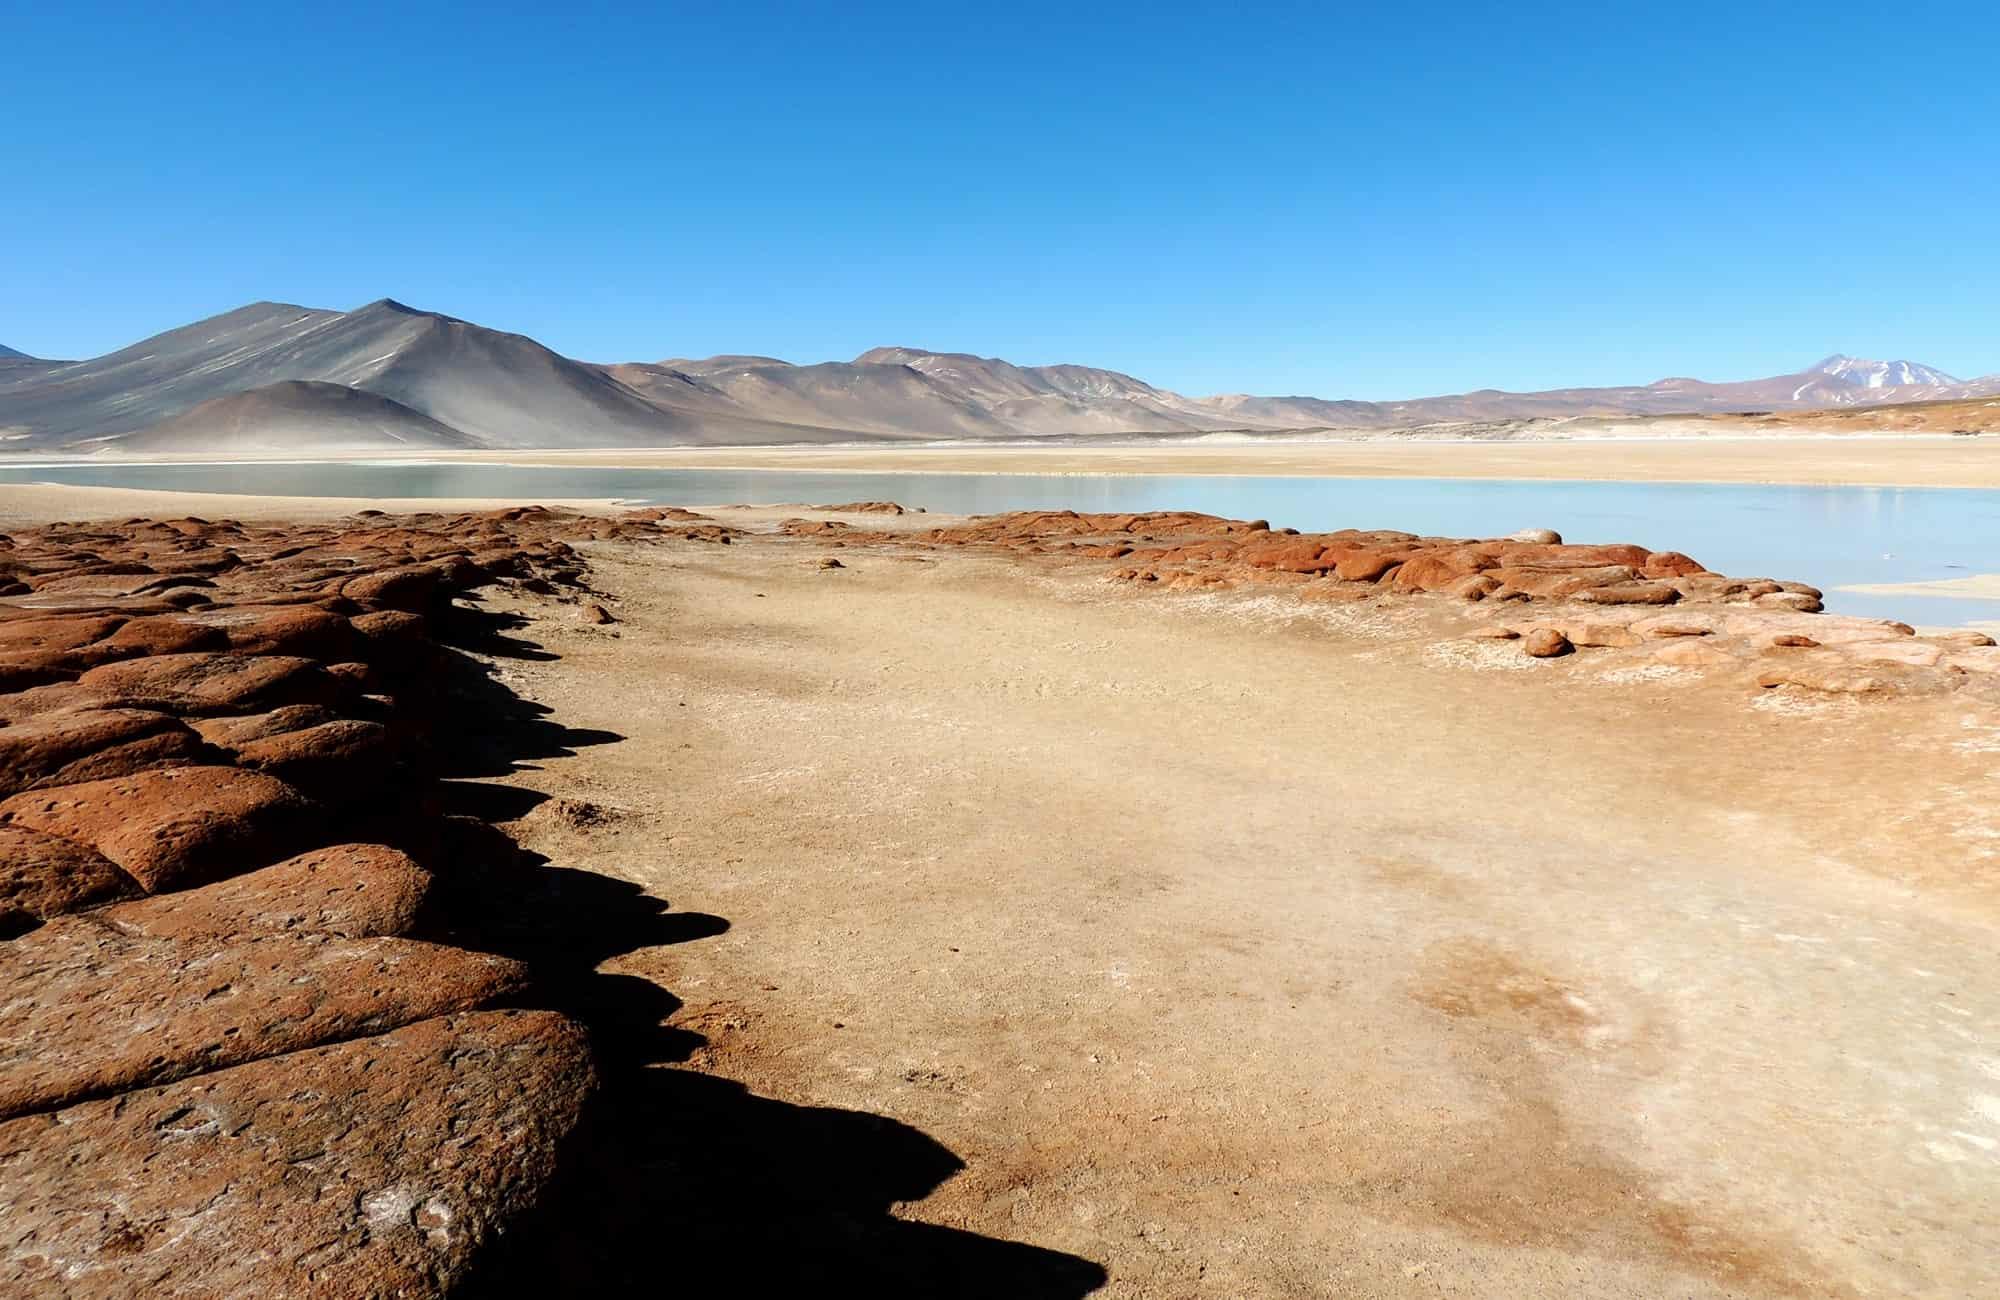 Voyage au Chili - Piedras Rojas - Amplitudes